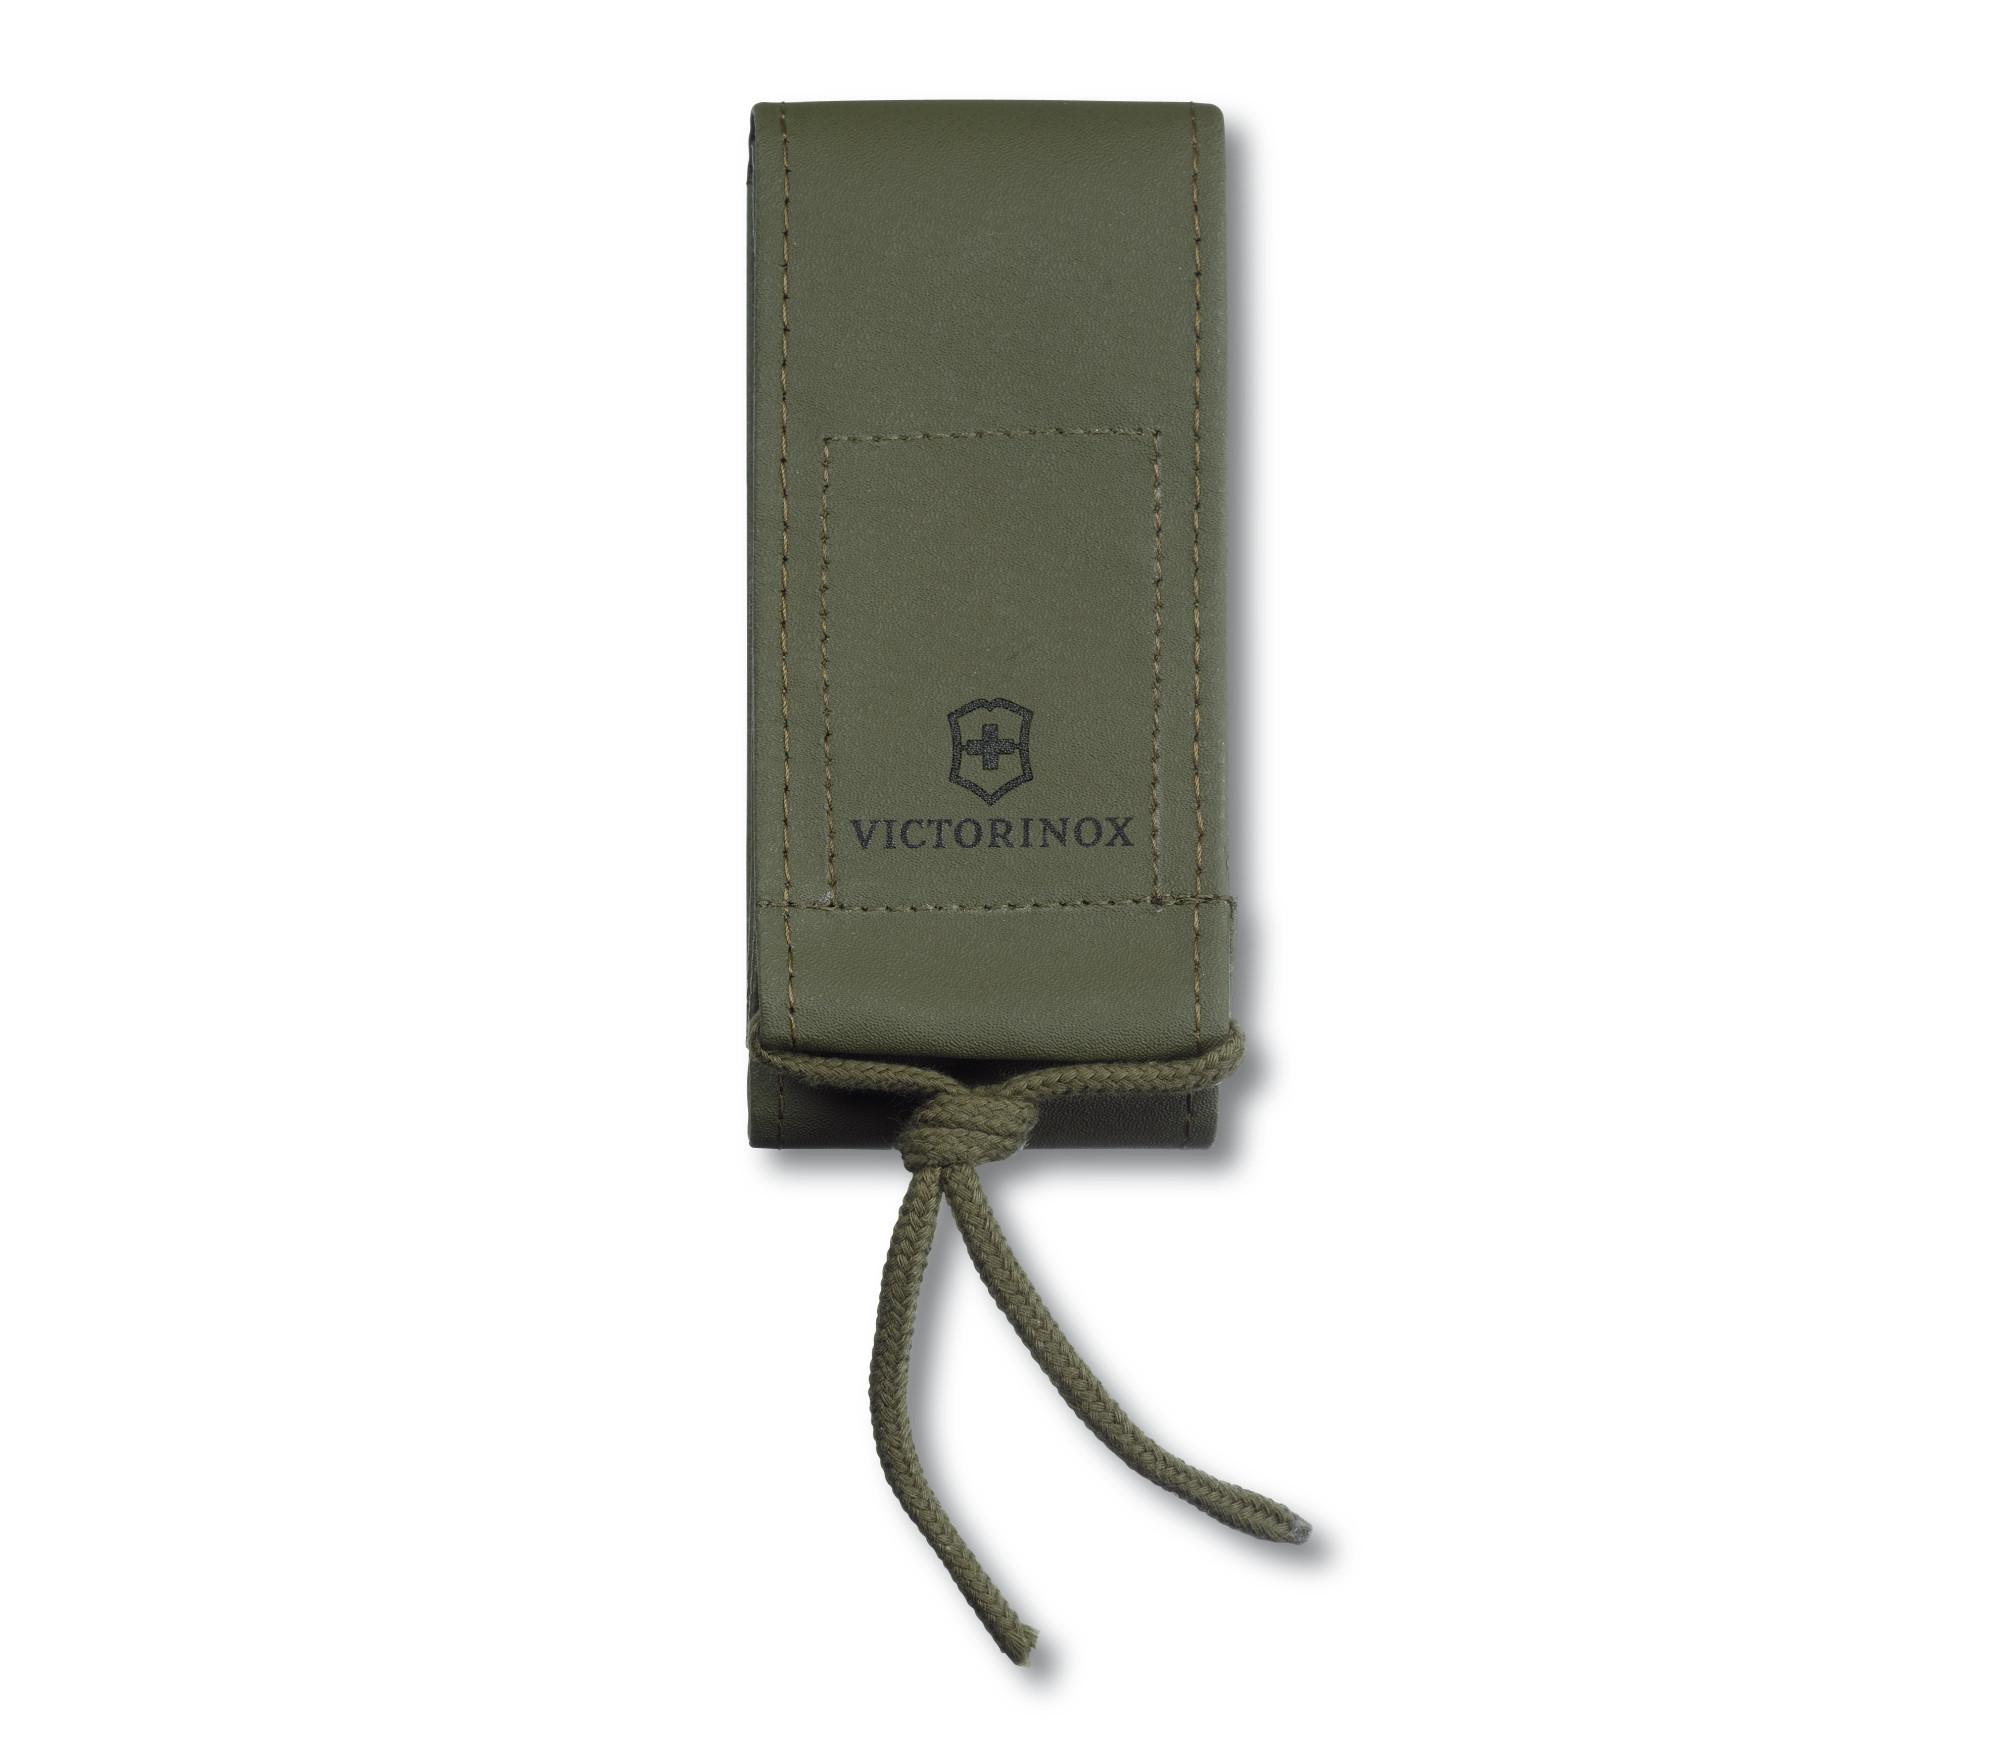 Чехол для ножей Victorinox 130 мм (4.0837.4)